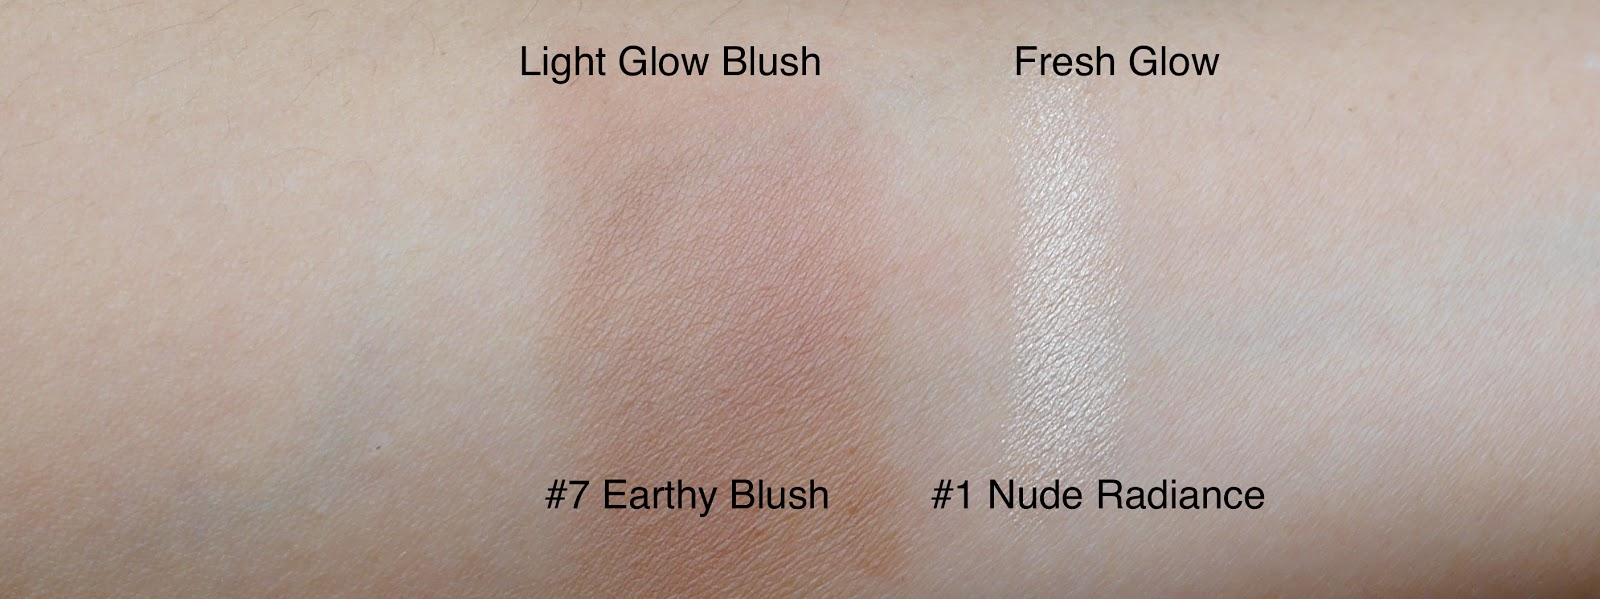 Fresh Glow - Highlighting Luminous Pen by Burberry Beauty #8